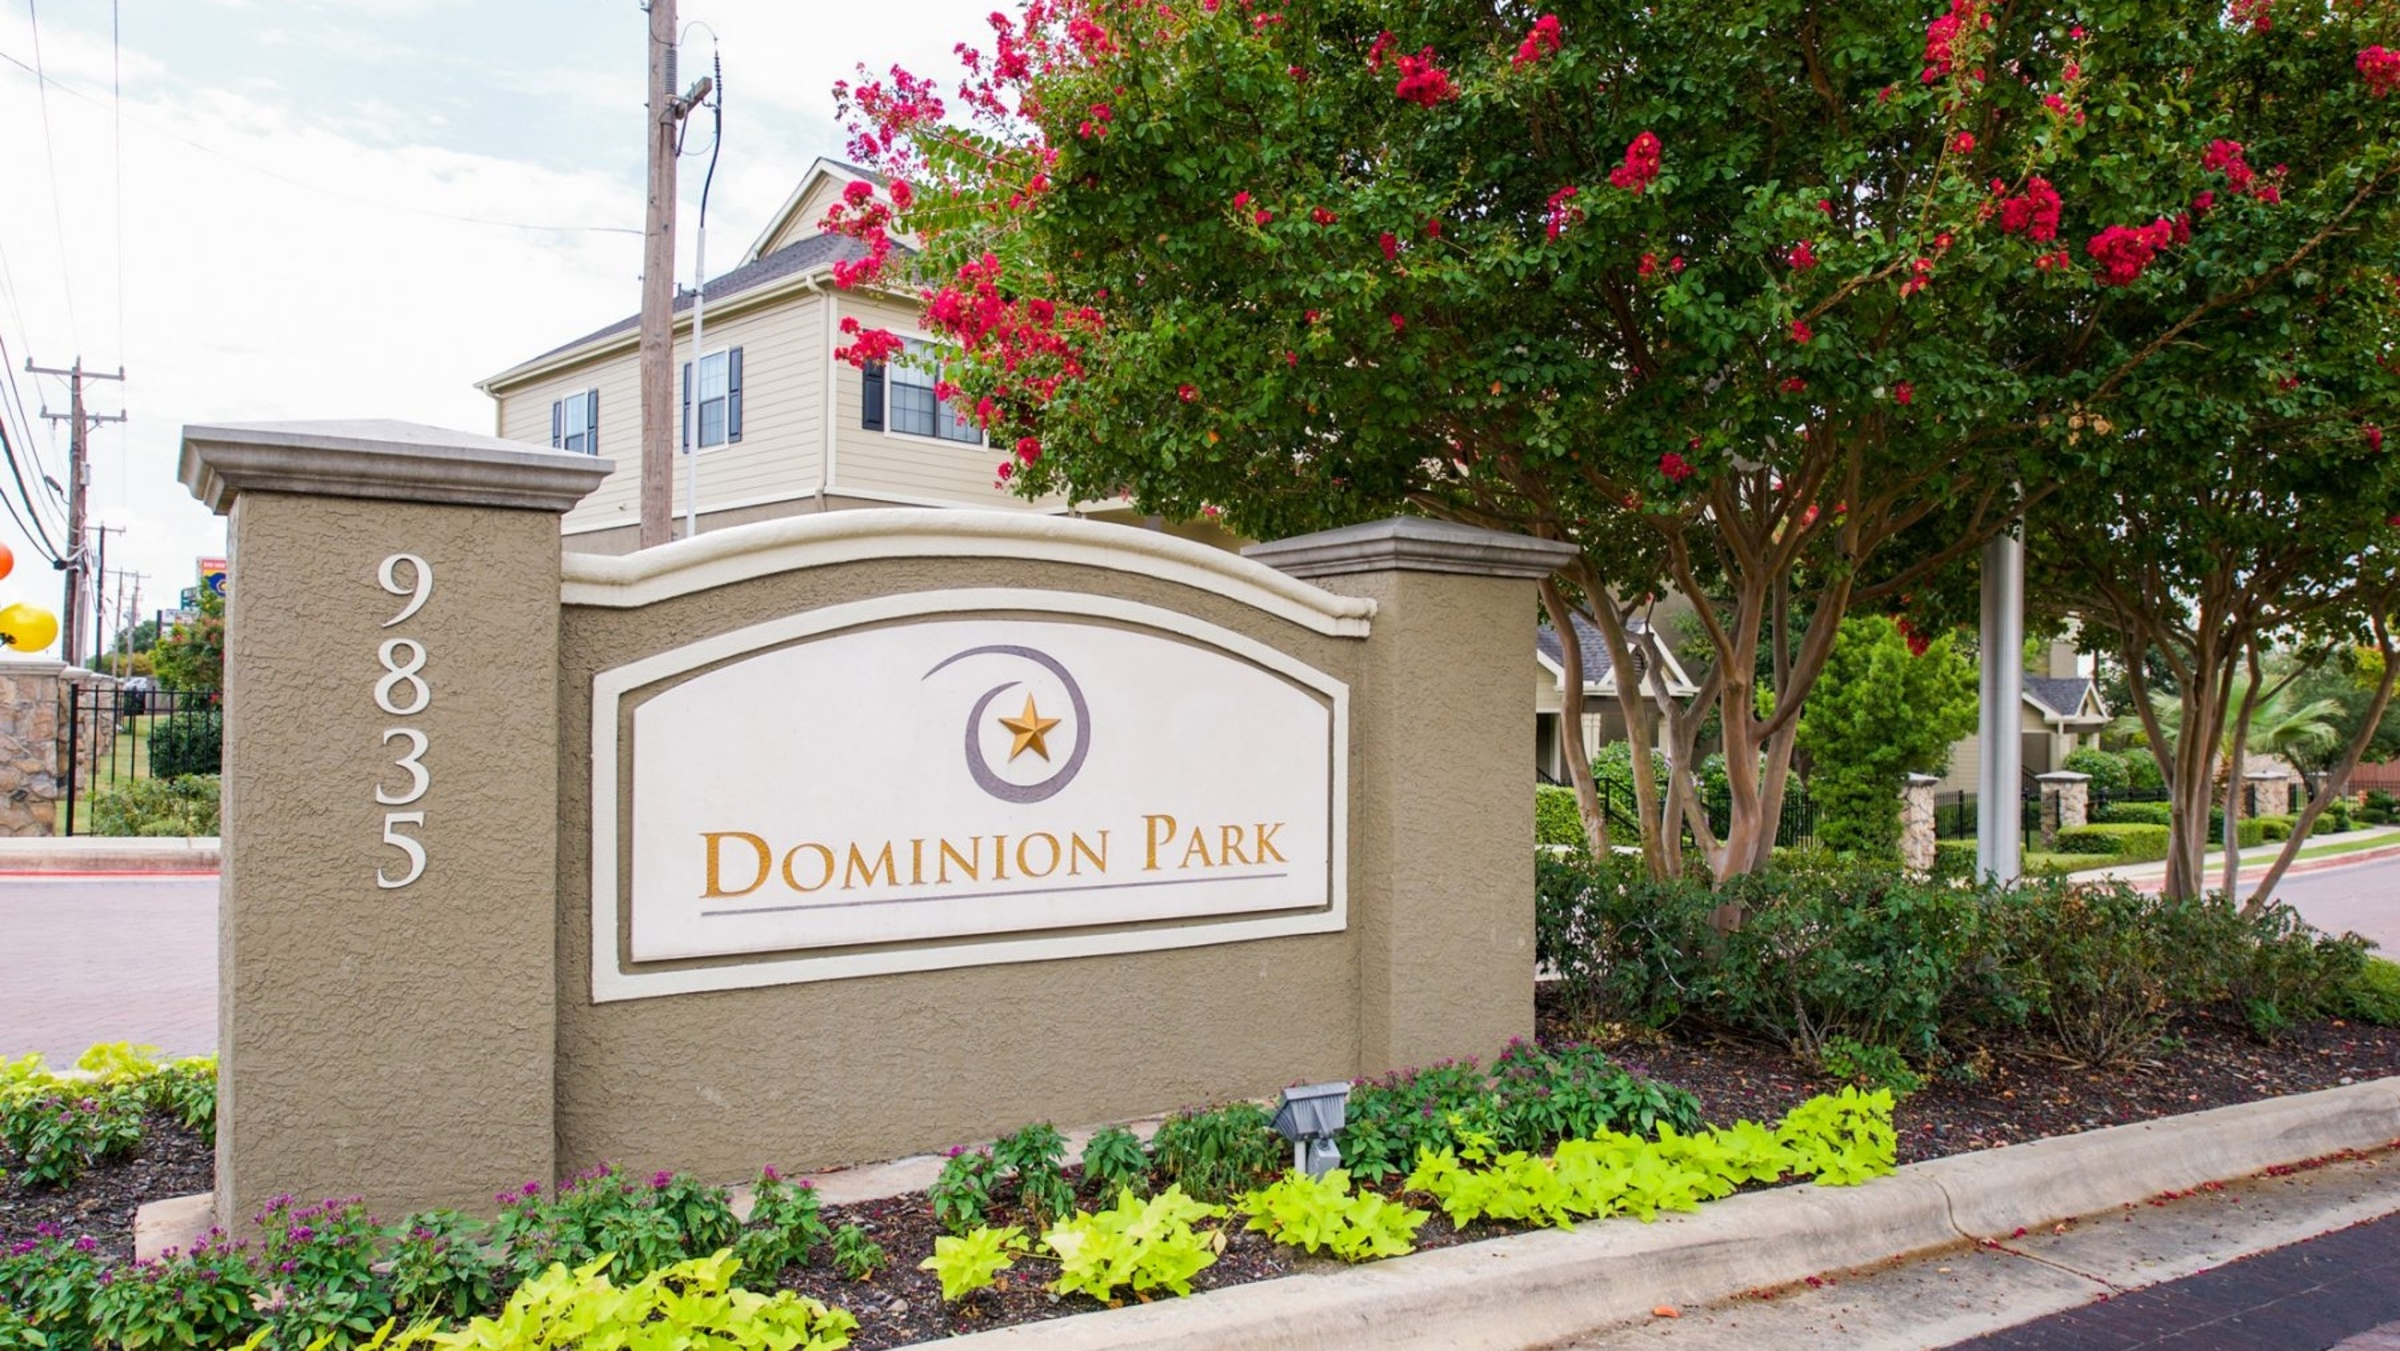 Dominion Park 837